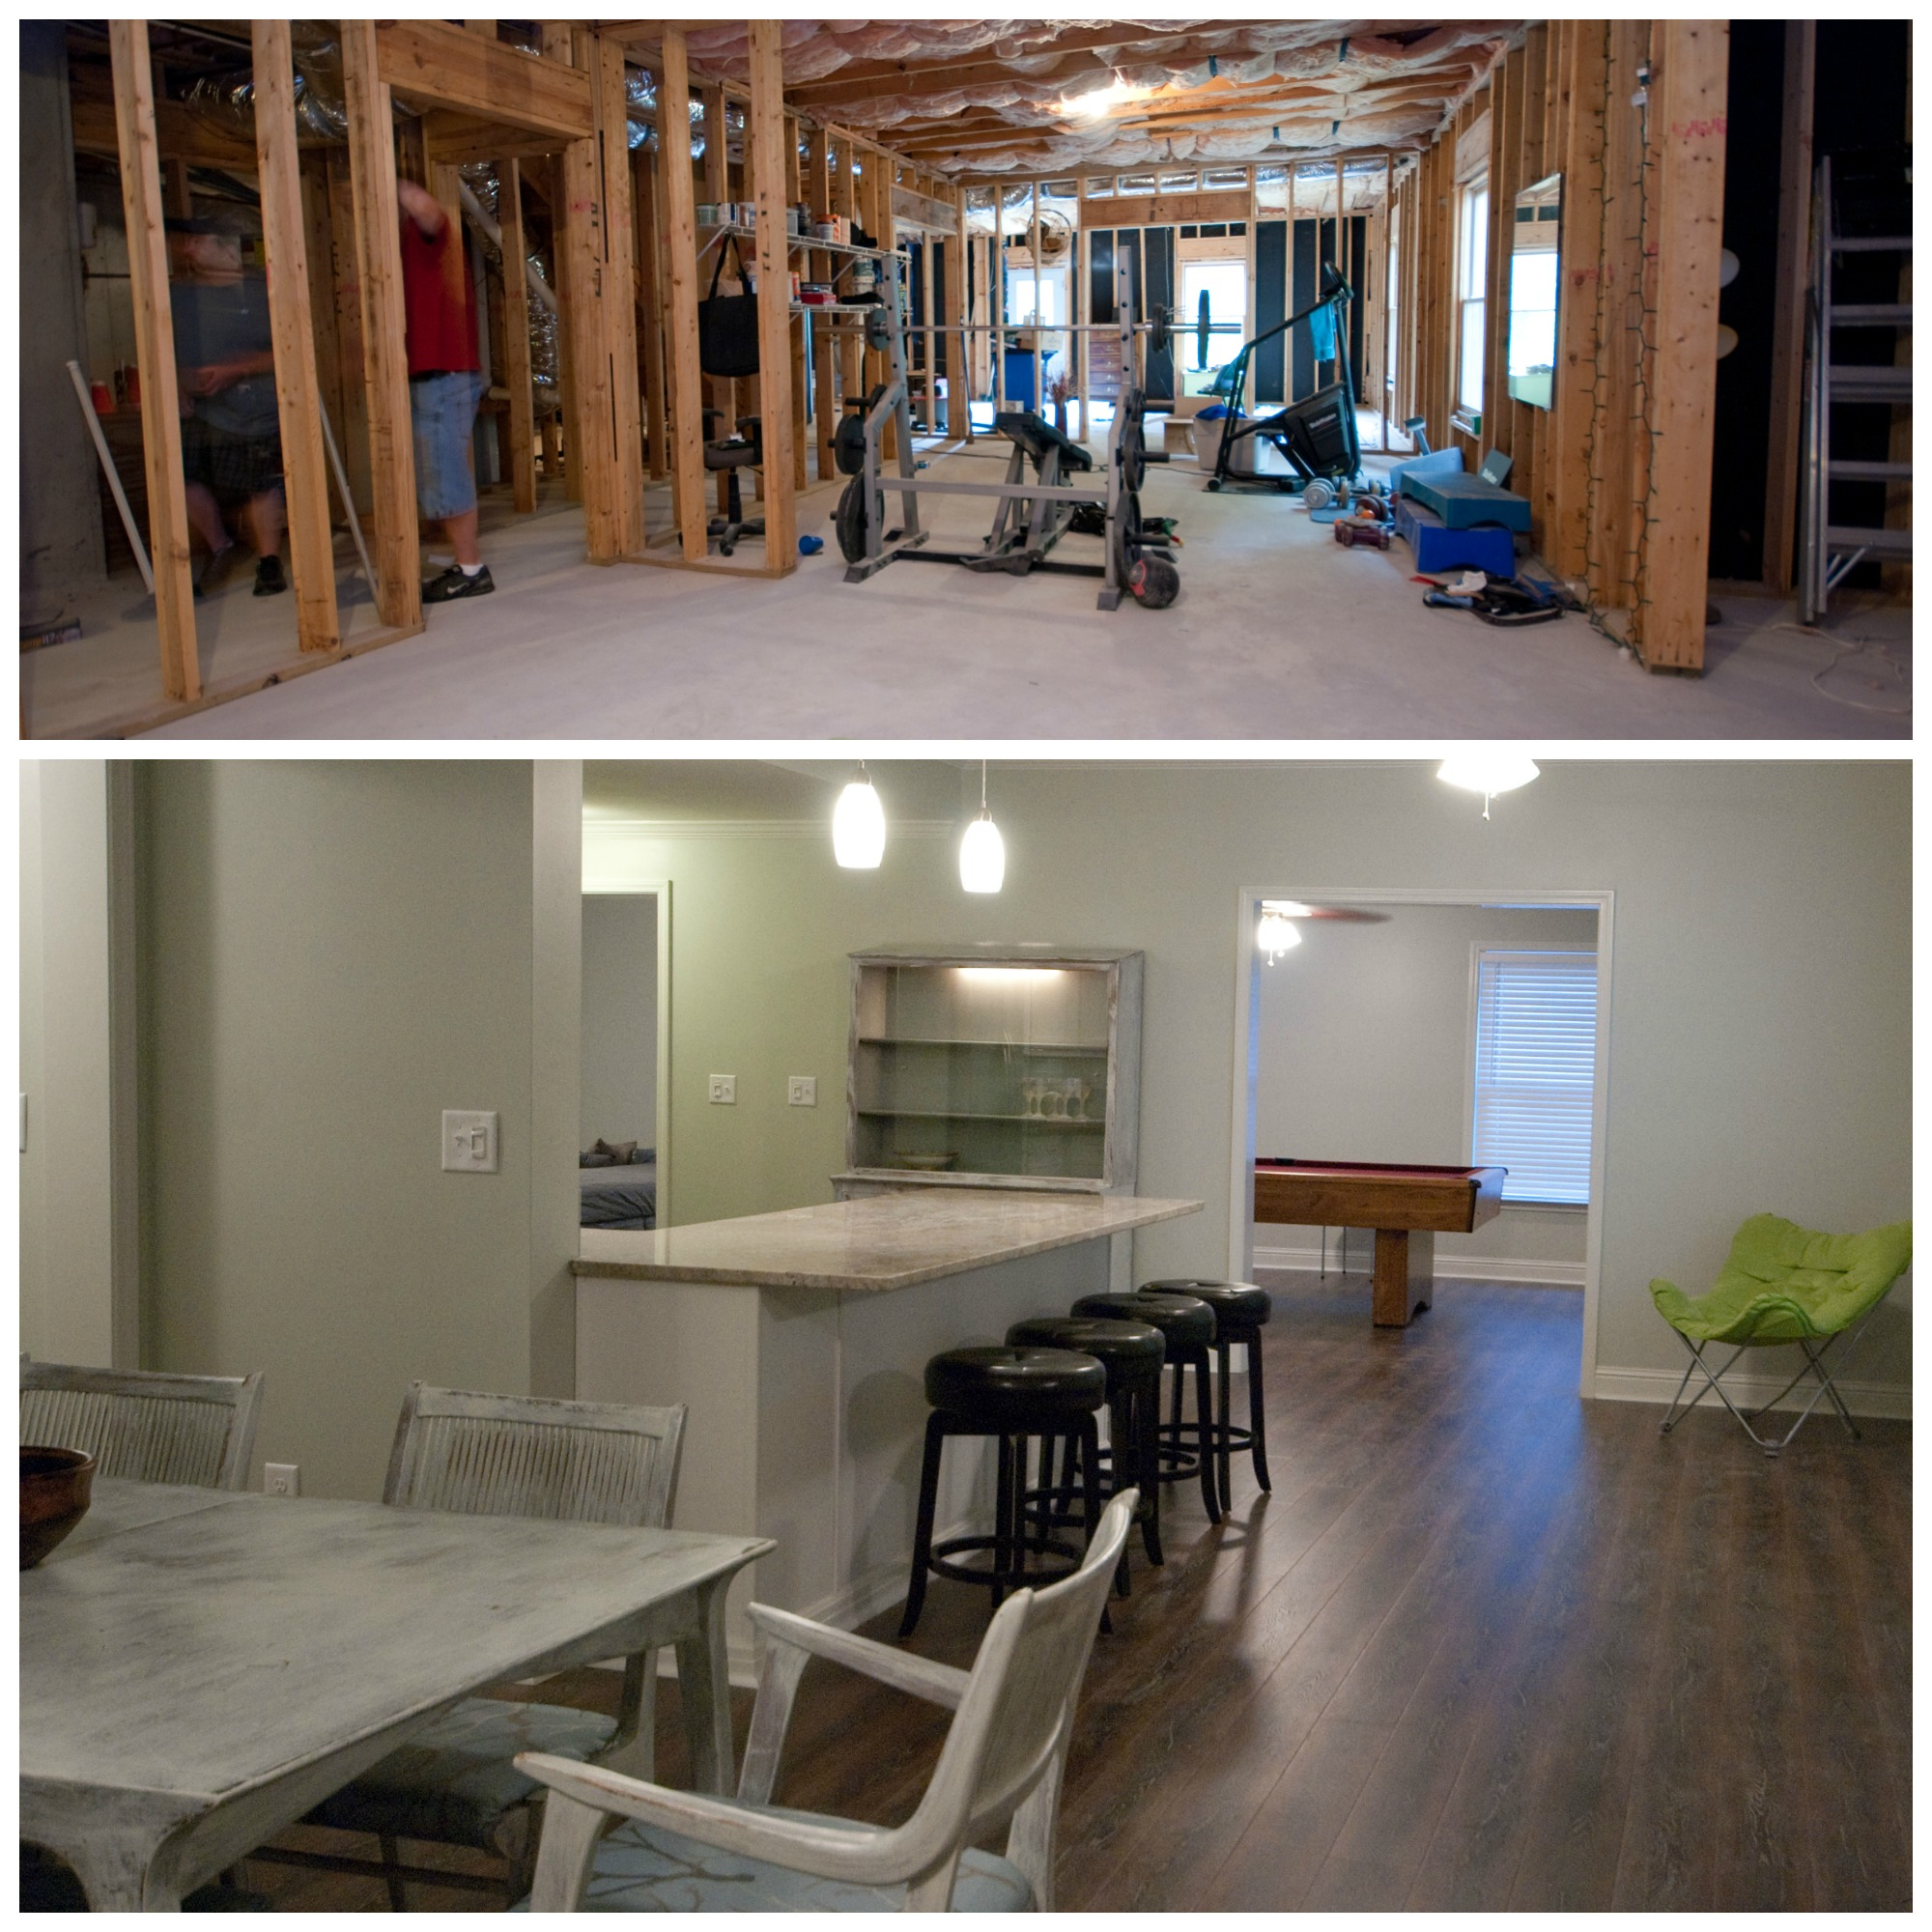 Basement renovation via Drum Home